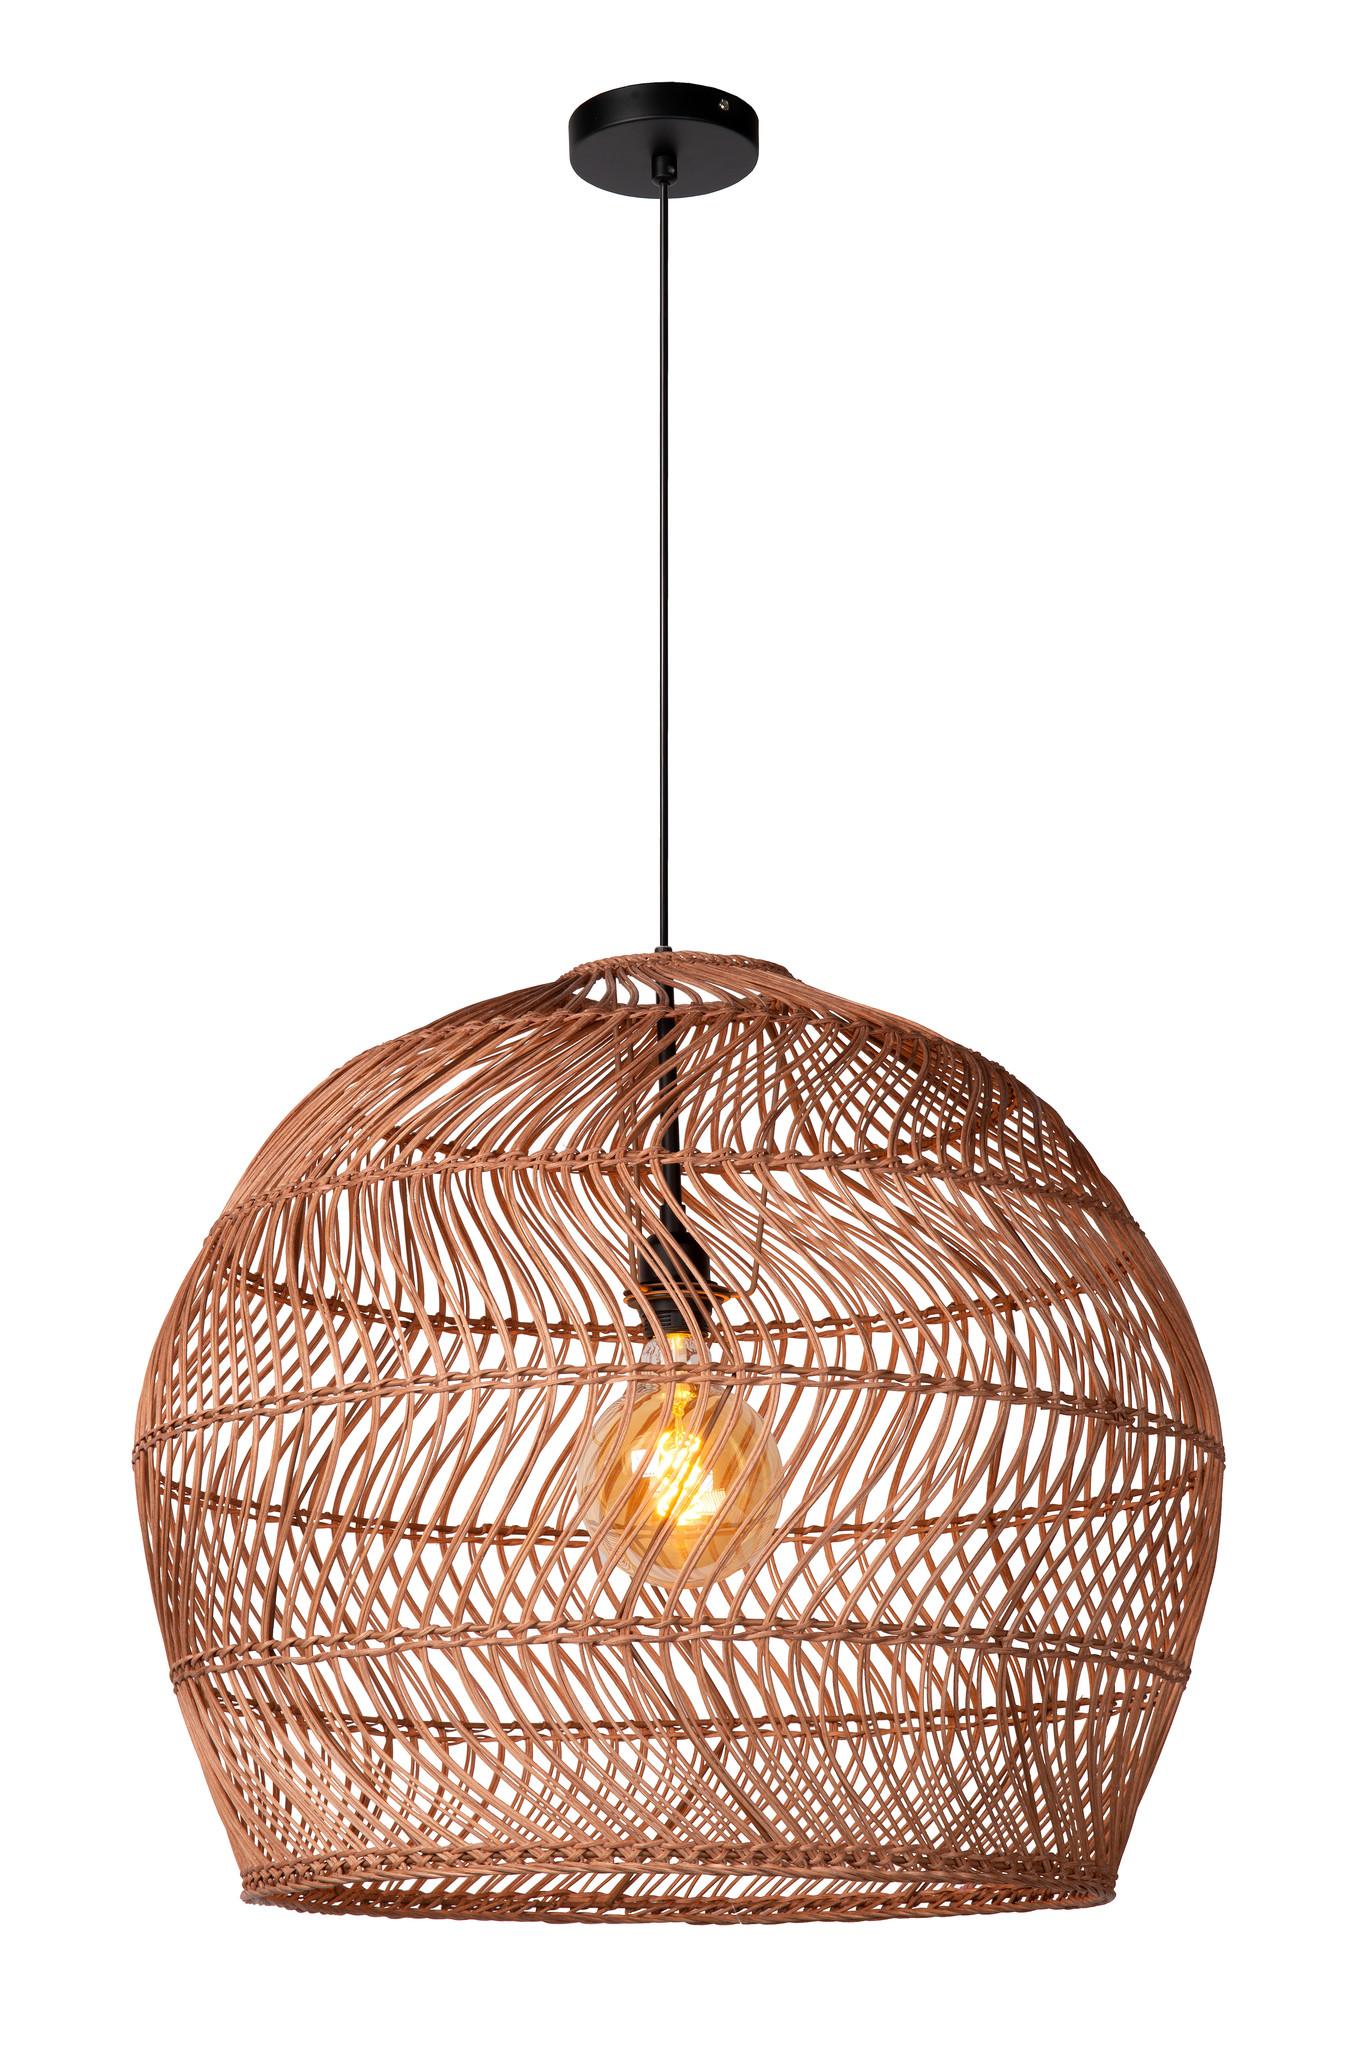 Lucide MOLOKO Hanglamp-Okerge.-Ø65-1xE27-40W-Rotan